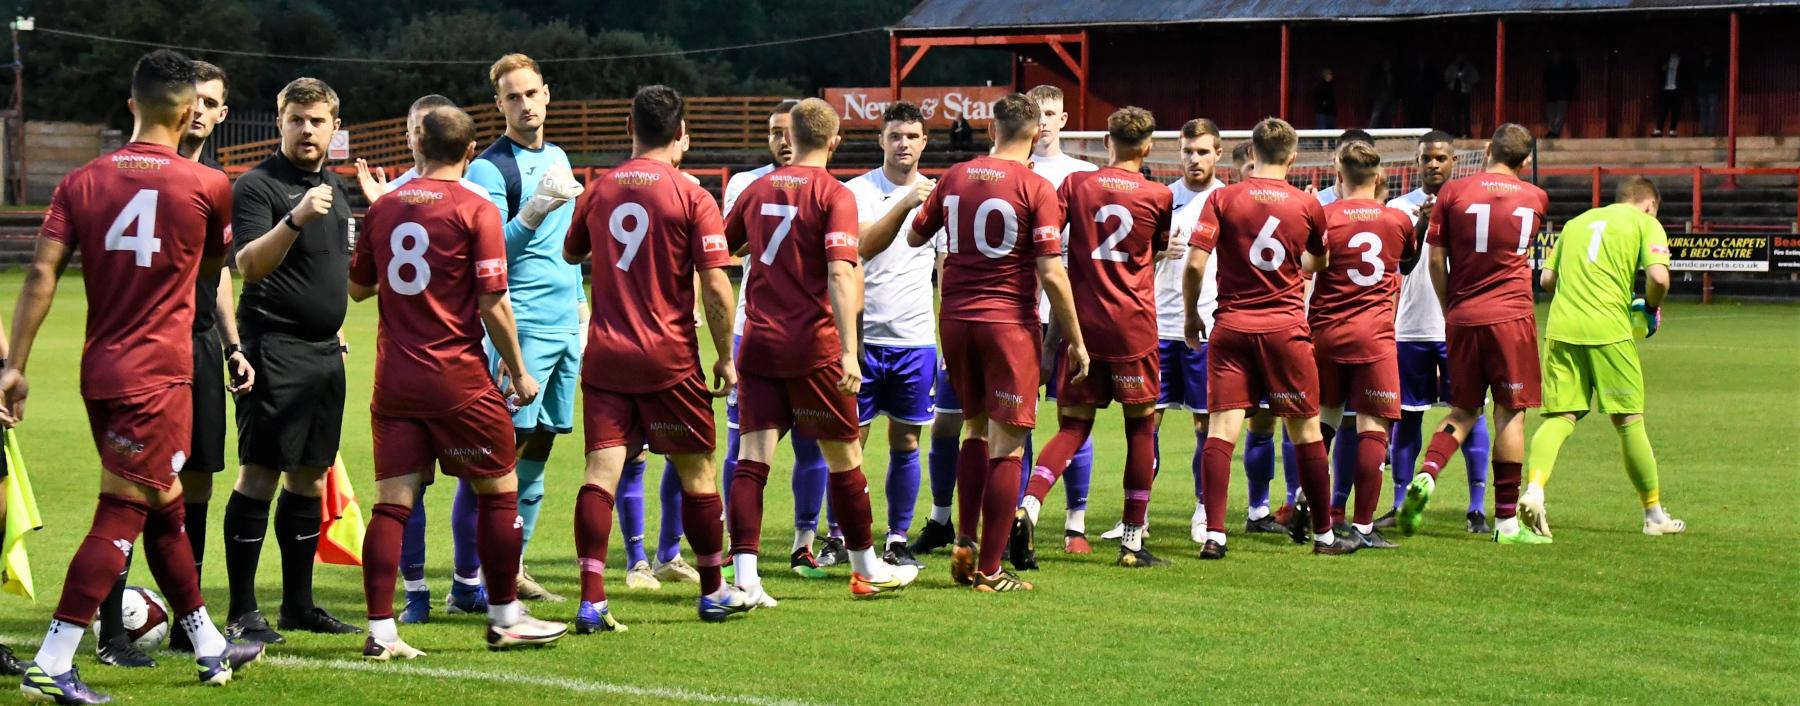 Workington-AFC-v-Ramsbottom-Utd-Ben-Challis